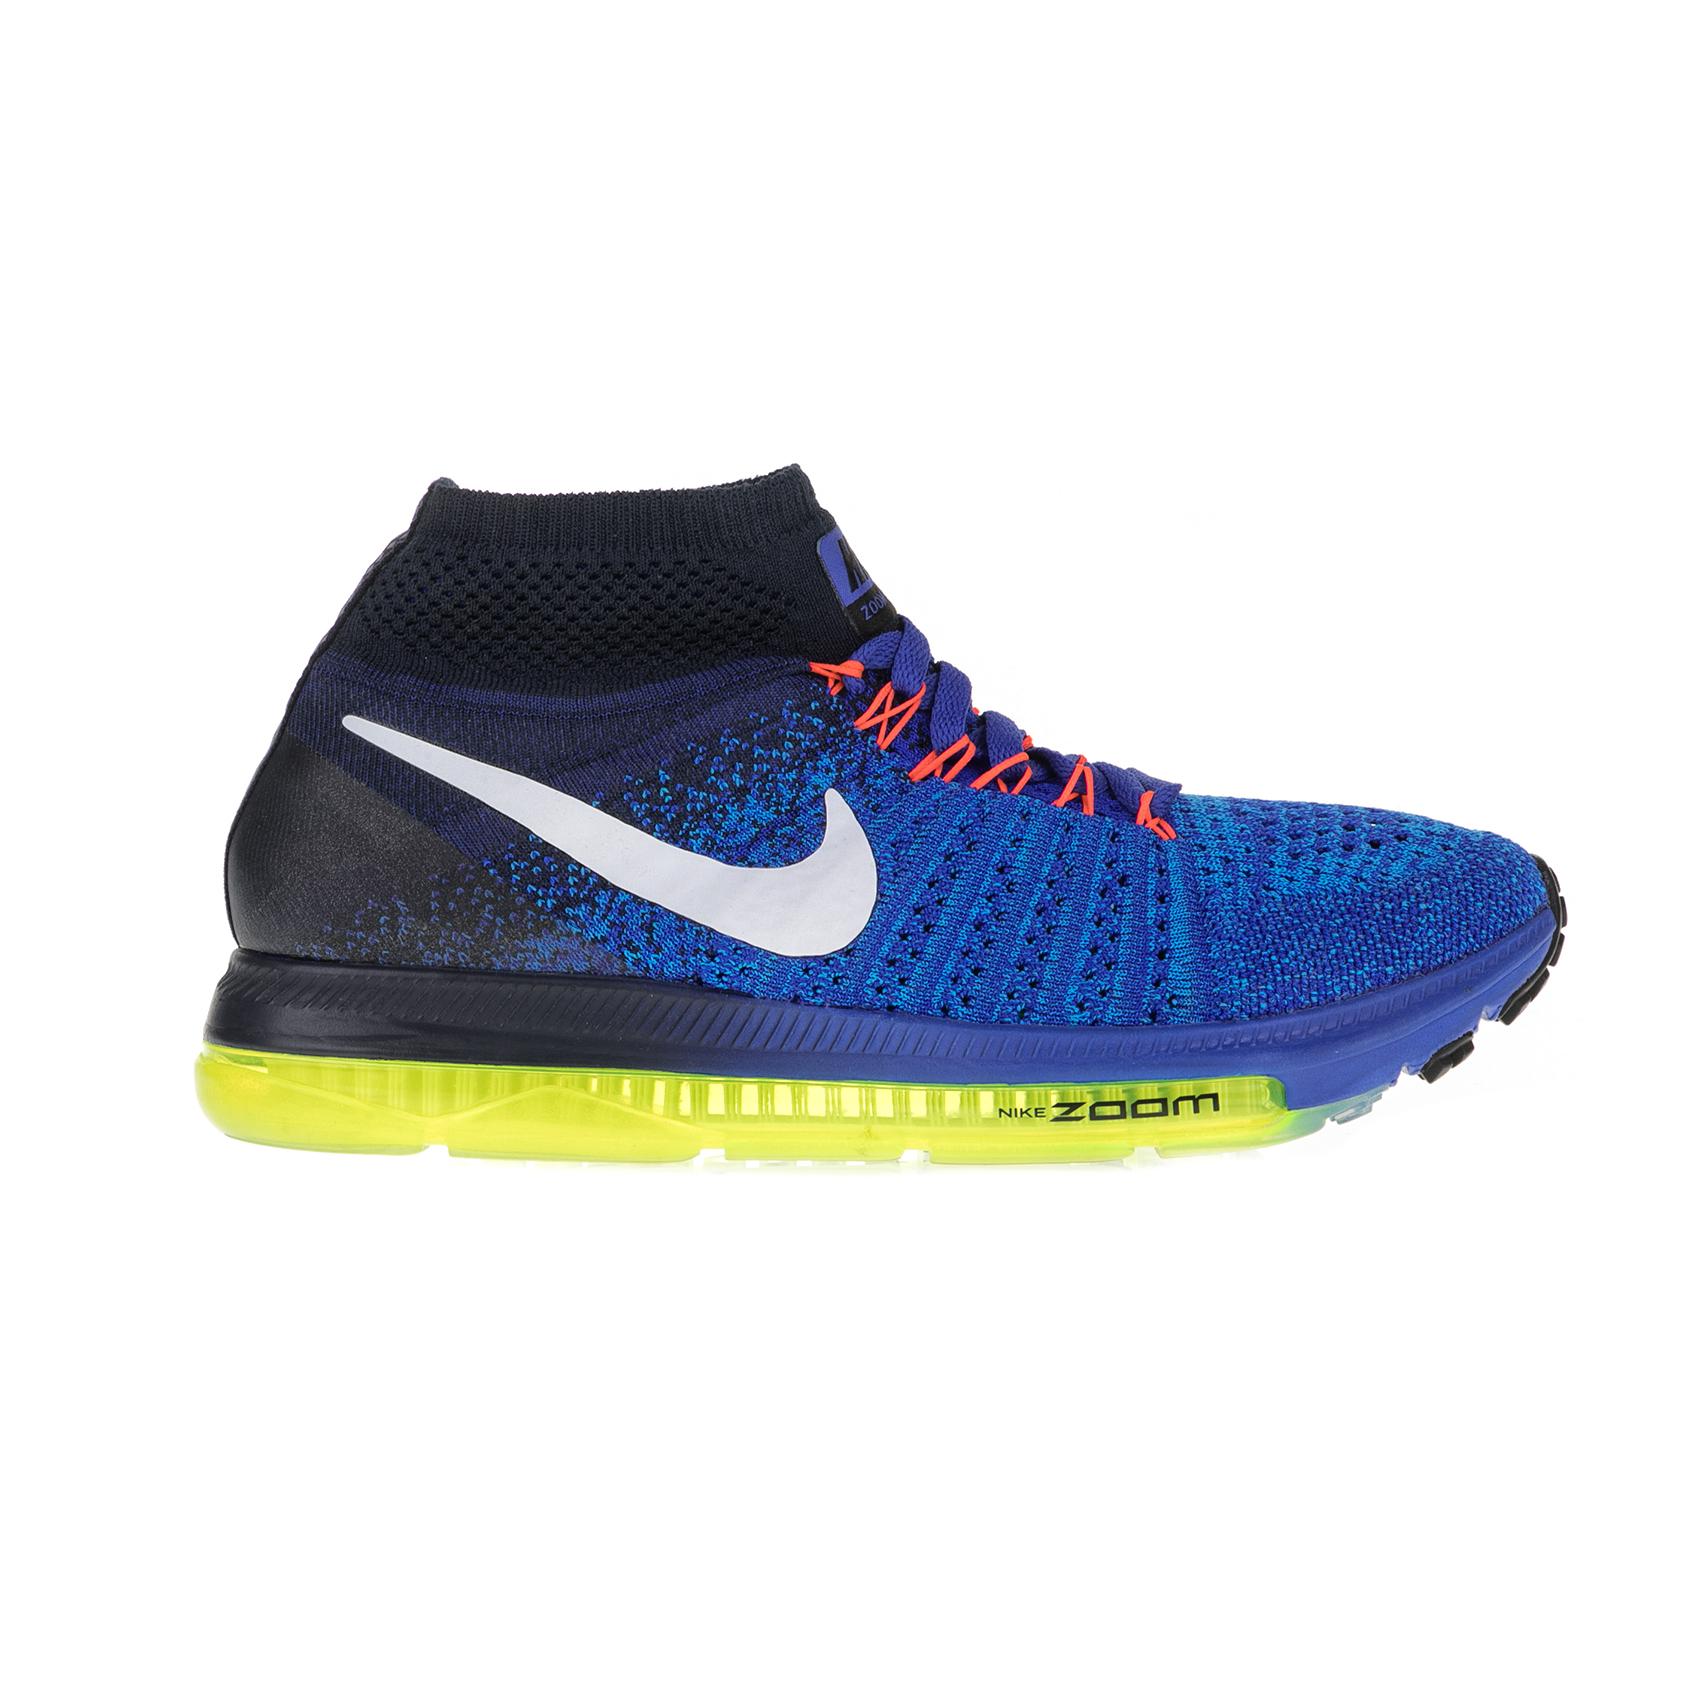 NIKE – Γυναικεία αθλητικά παπούτσια Nike ZOOM ALL OUT FLYKNIT μπλε